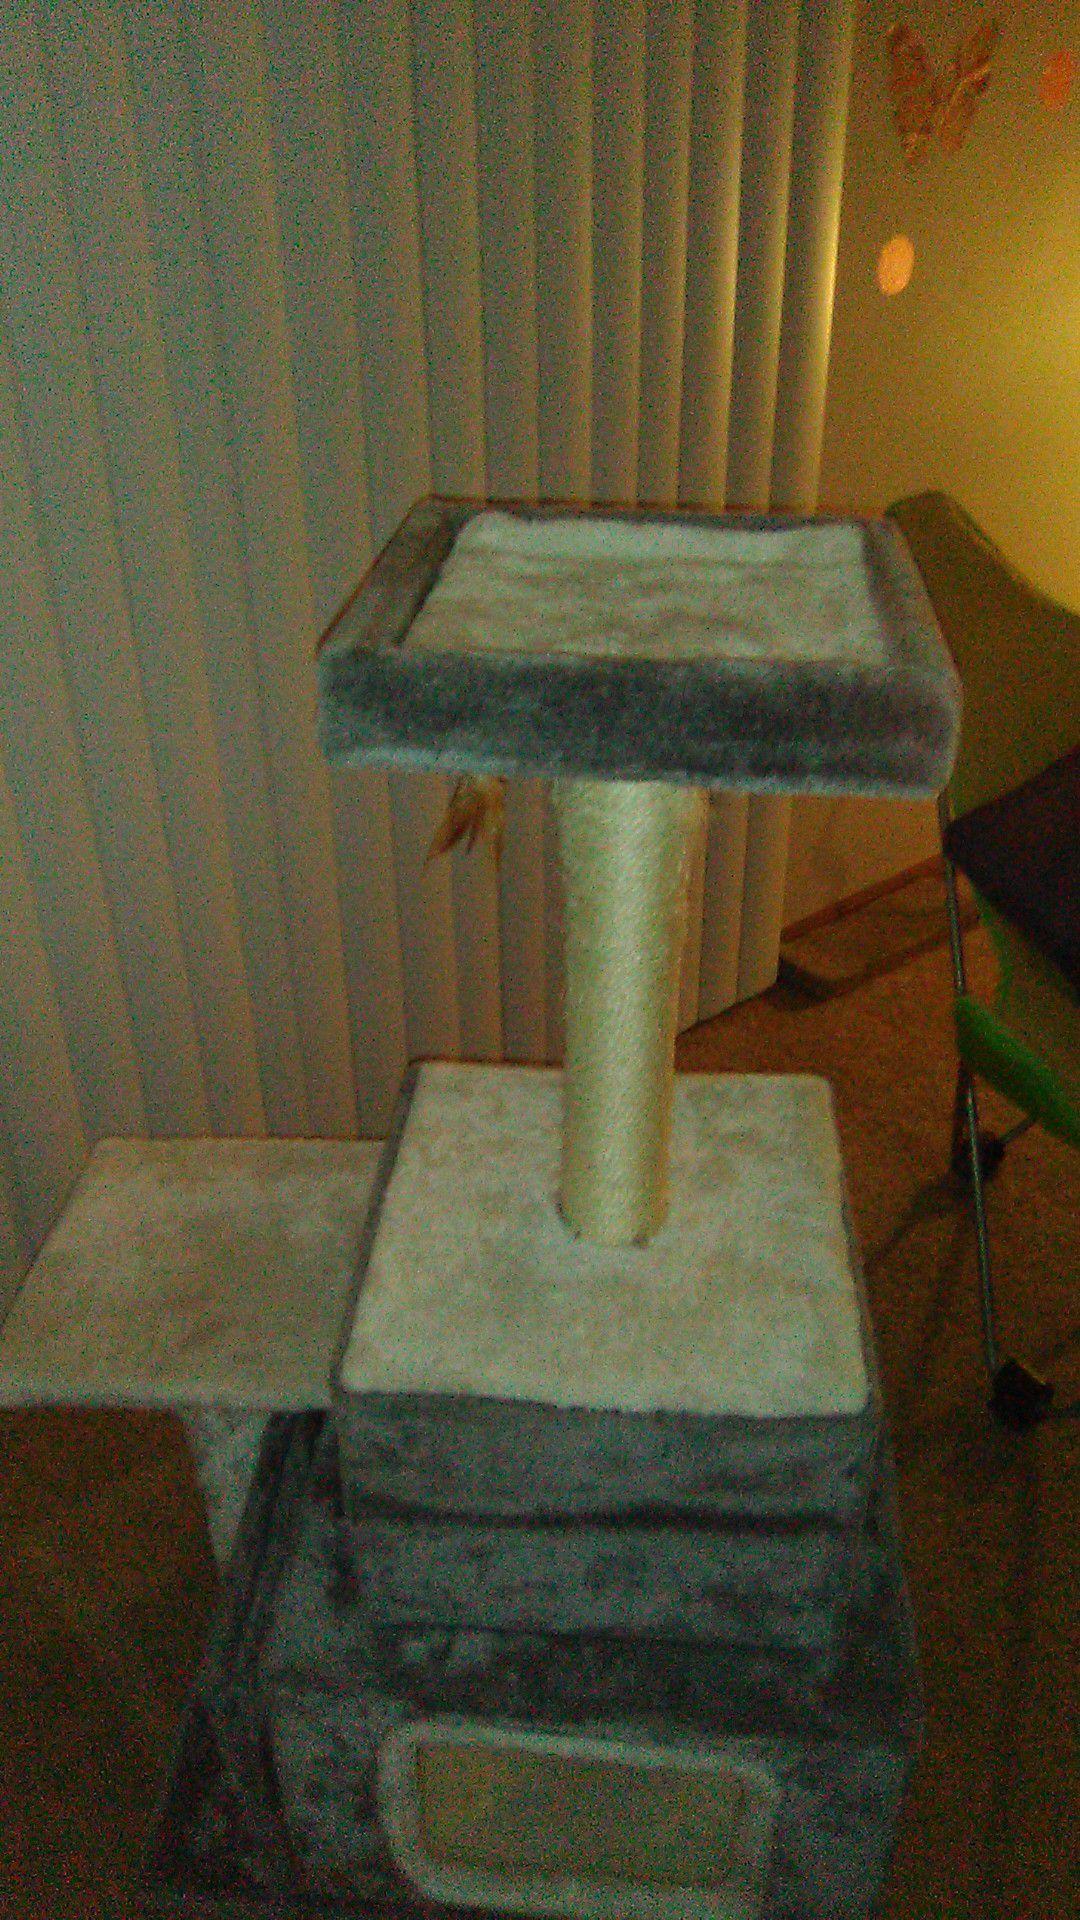 Cat tree brand new